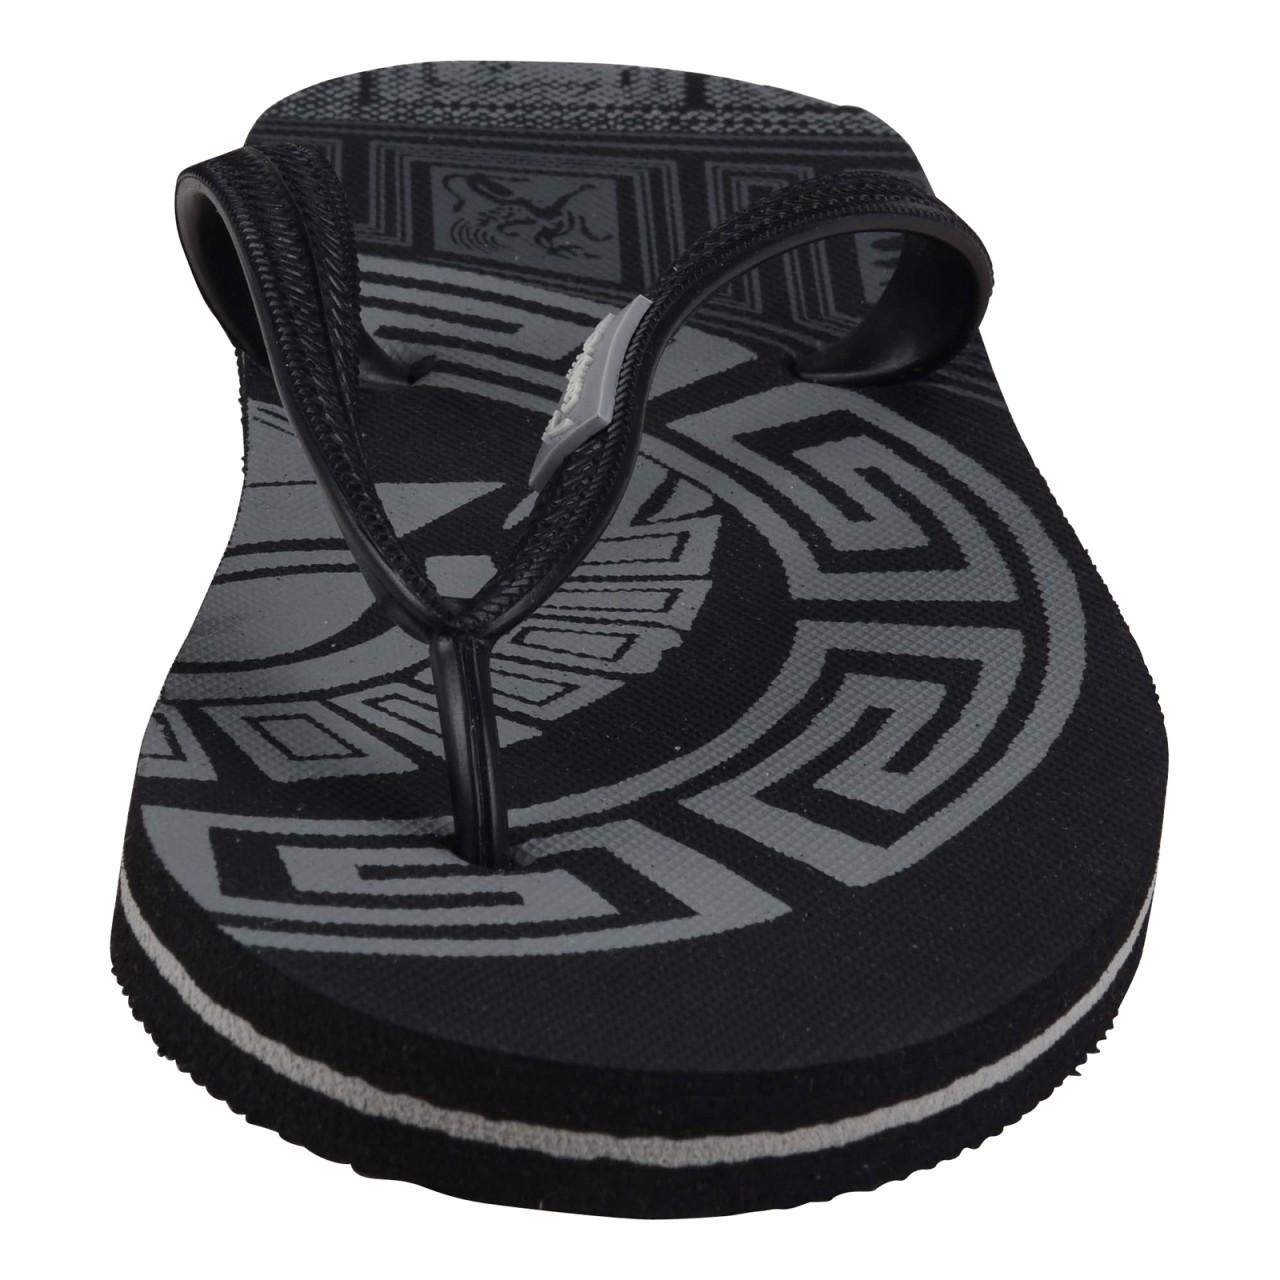 camprella herren zehentrenner flip flop schwarz. Black Bedroom Furniture Sets. Home Design Ideas